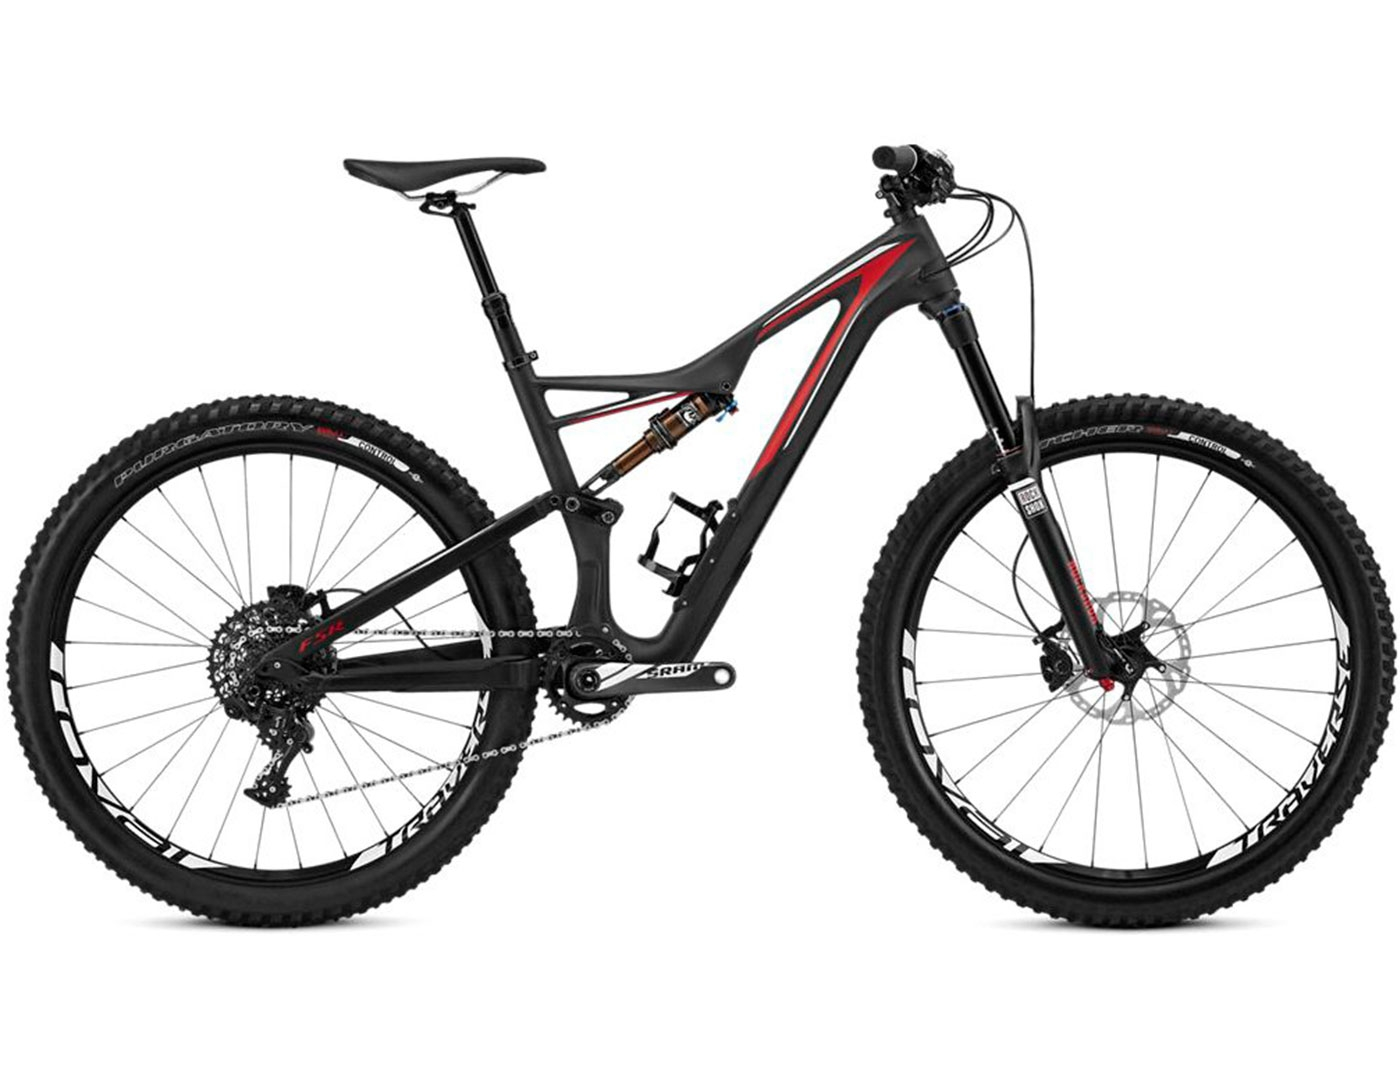 Велосипед Specialized Stumpjumper Fsr Expert Carbon 650B (2016)